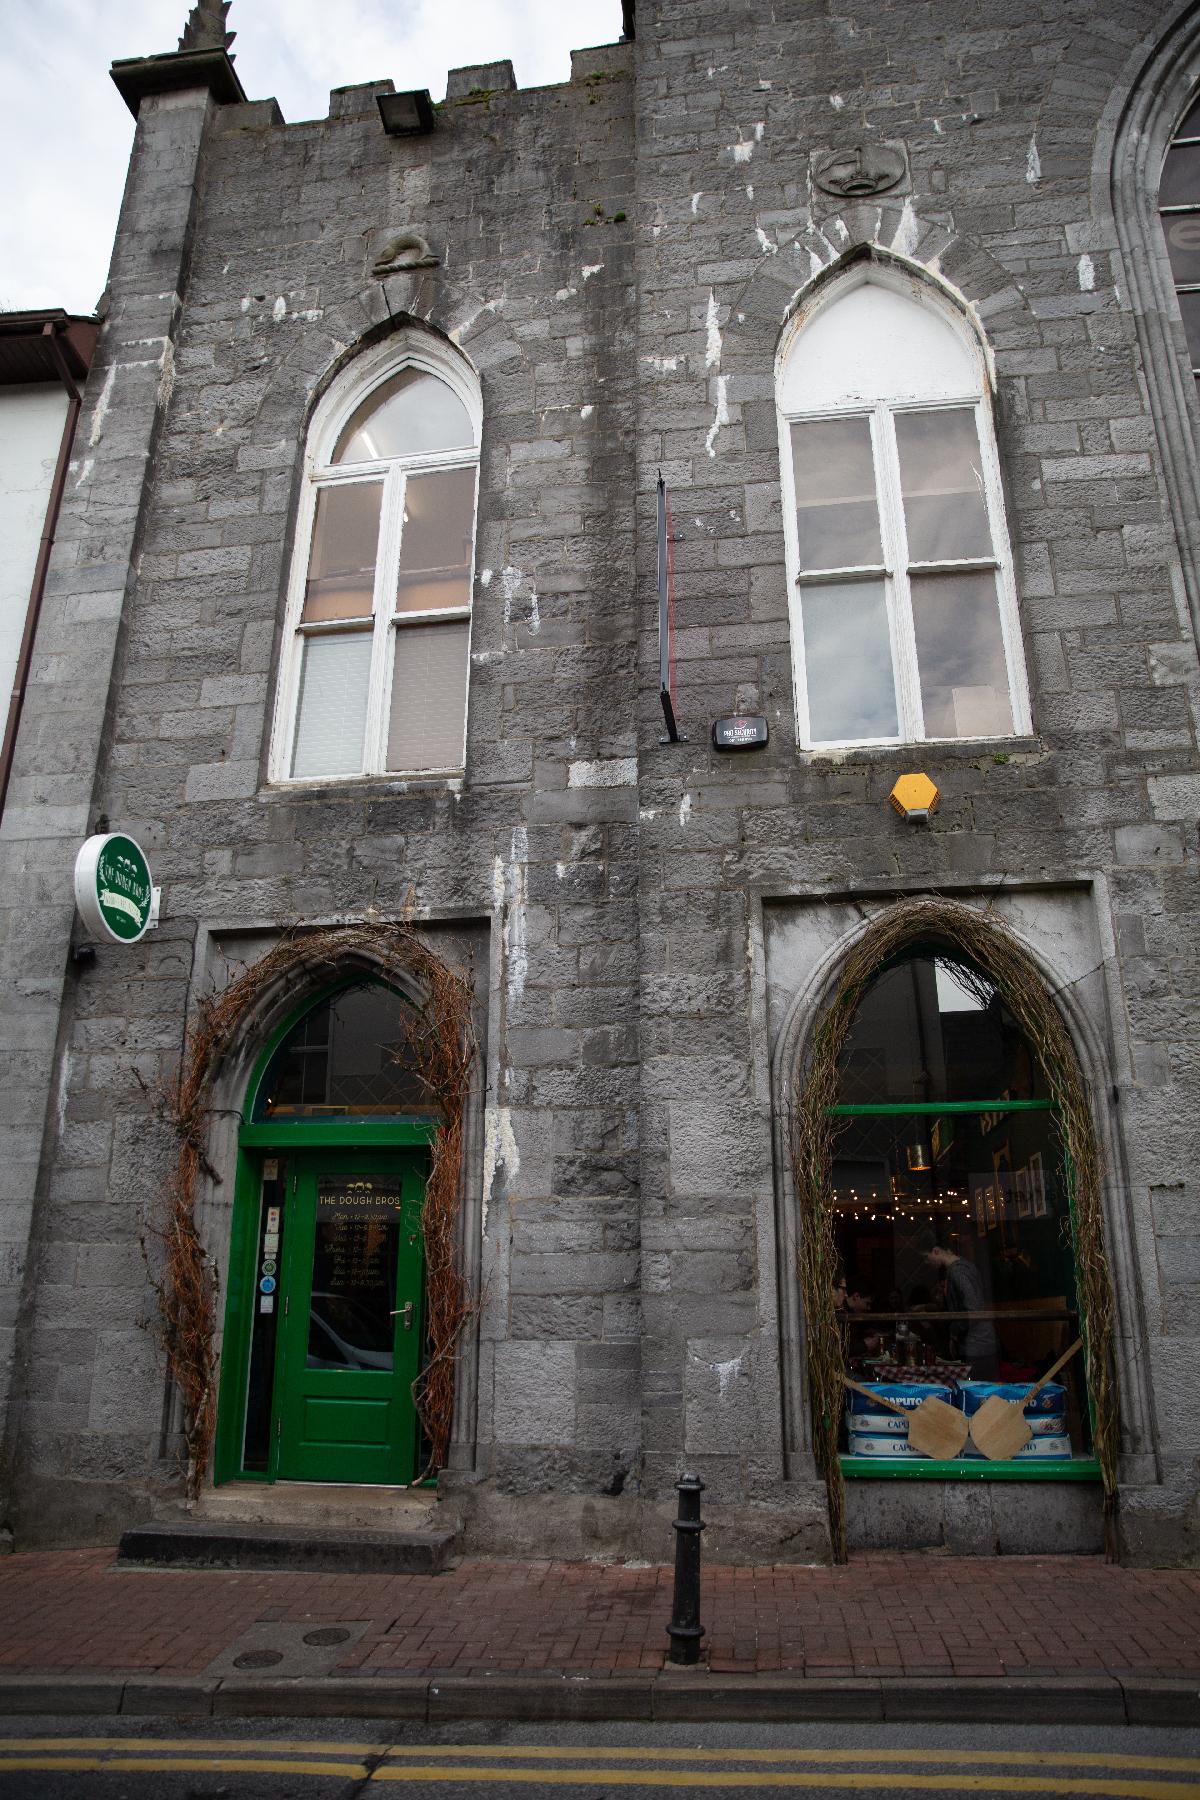 Dough Bros Pizza in Galway Ireland